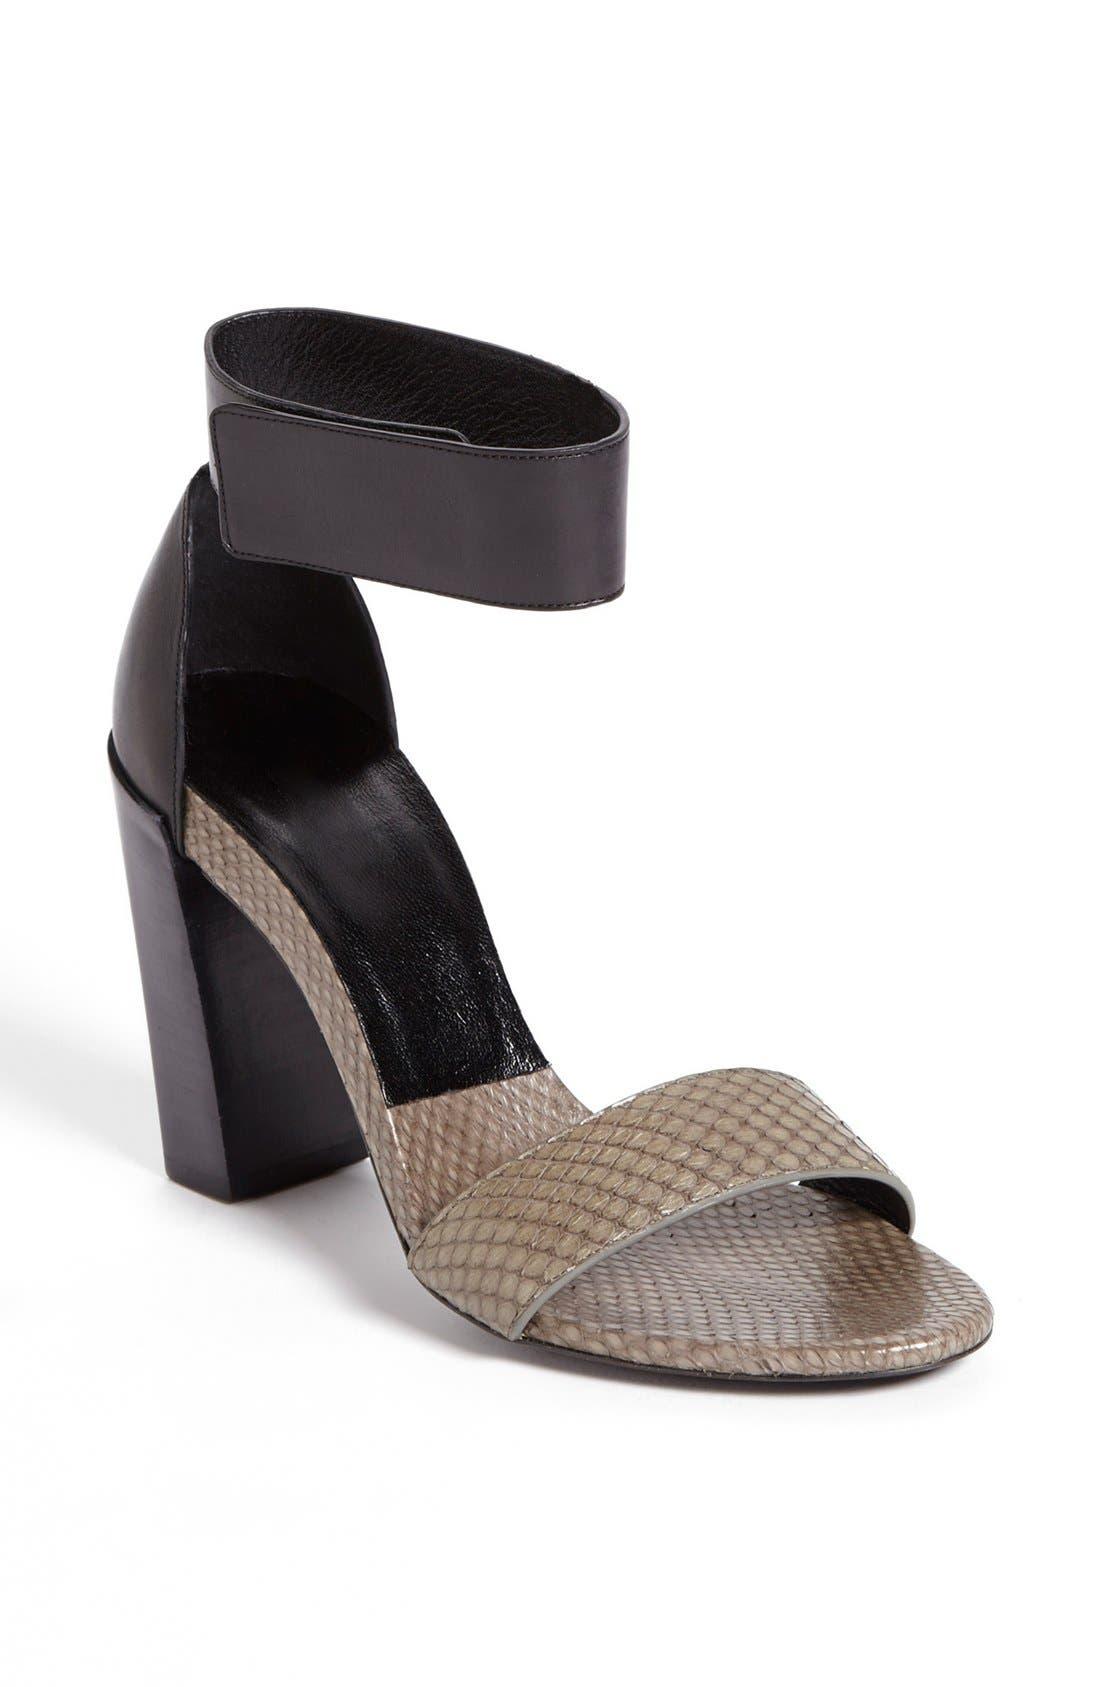 Alternate Image 1 Selected - Chloé 'Bema' Ankle Strap Sandal